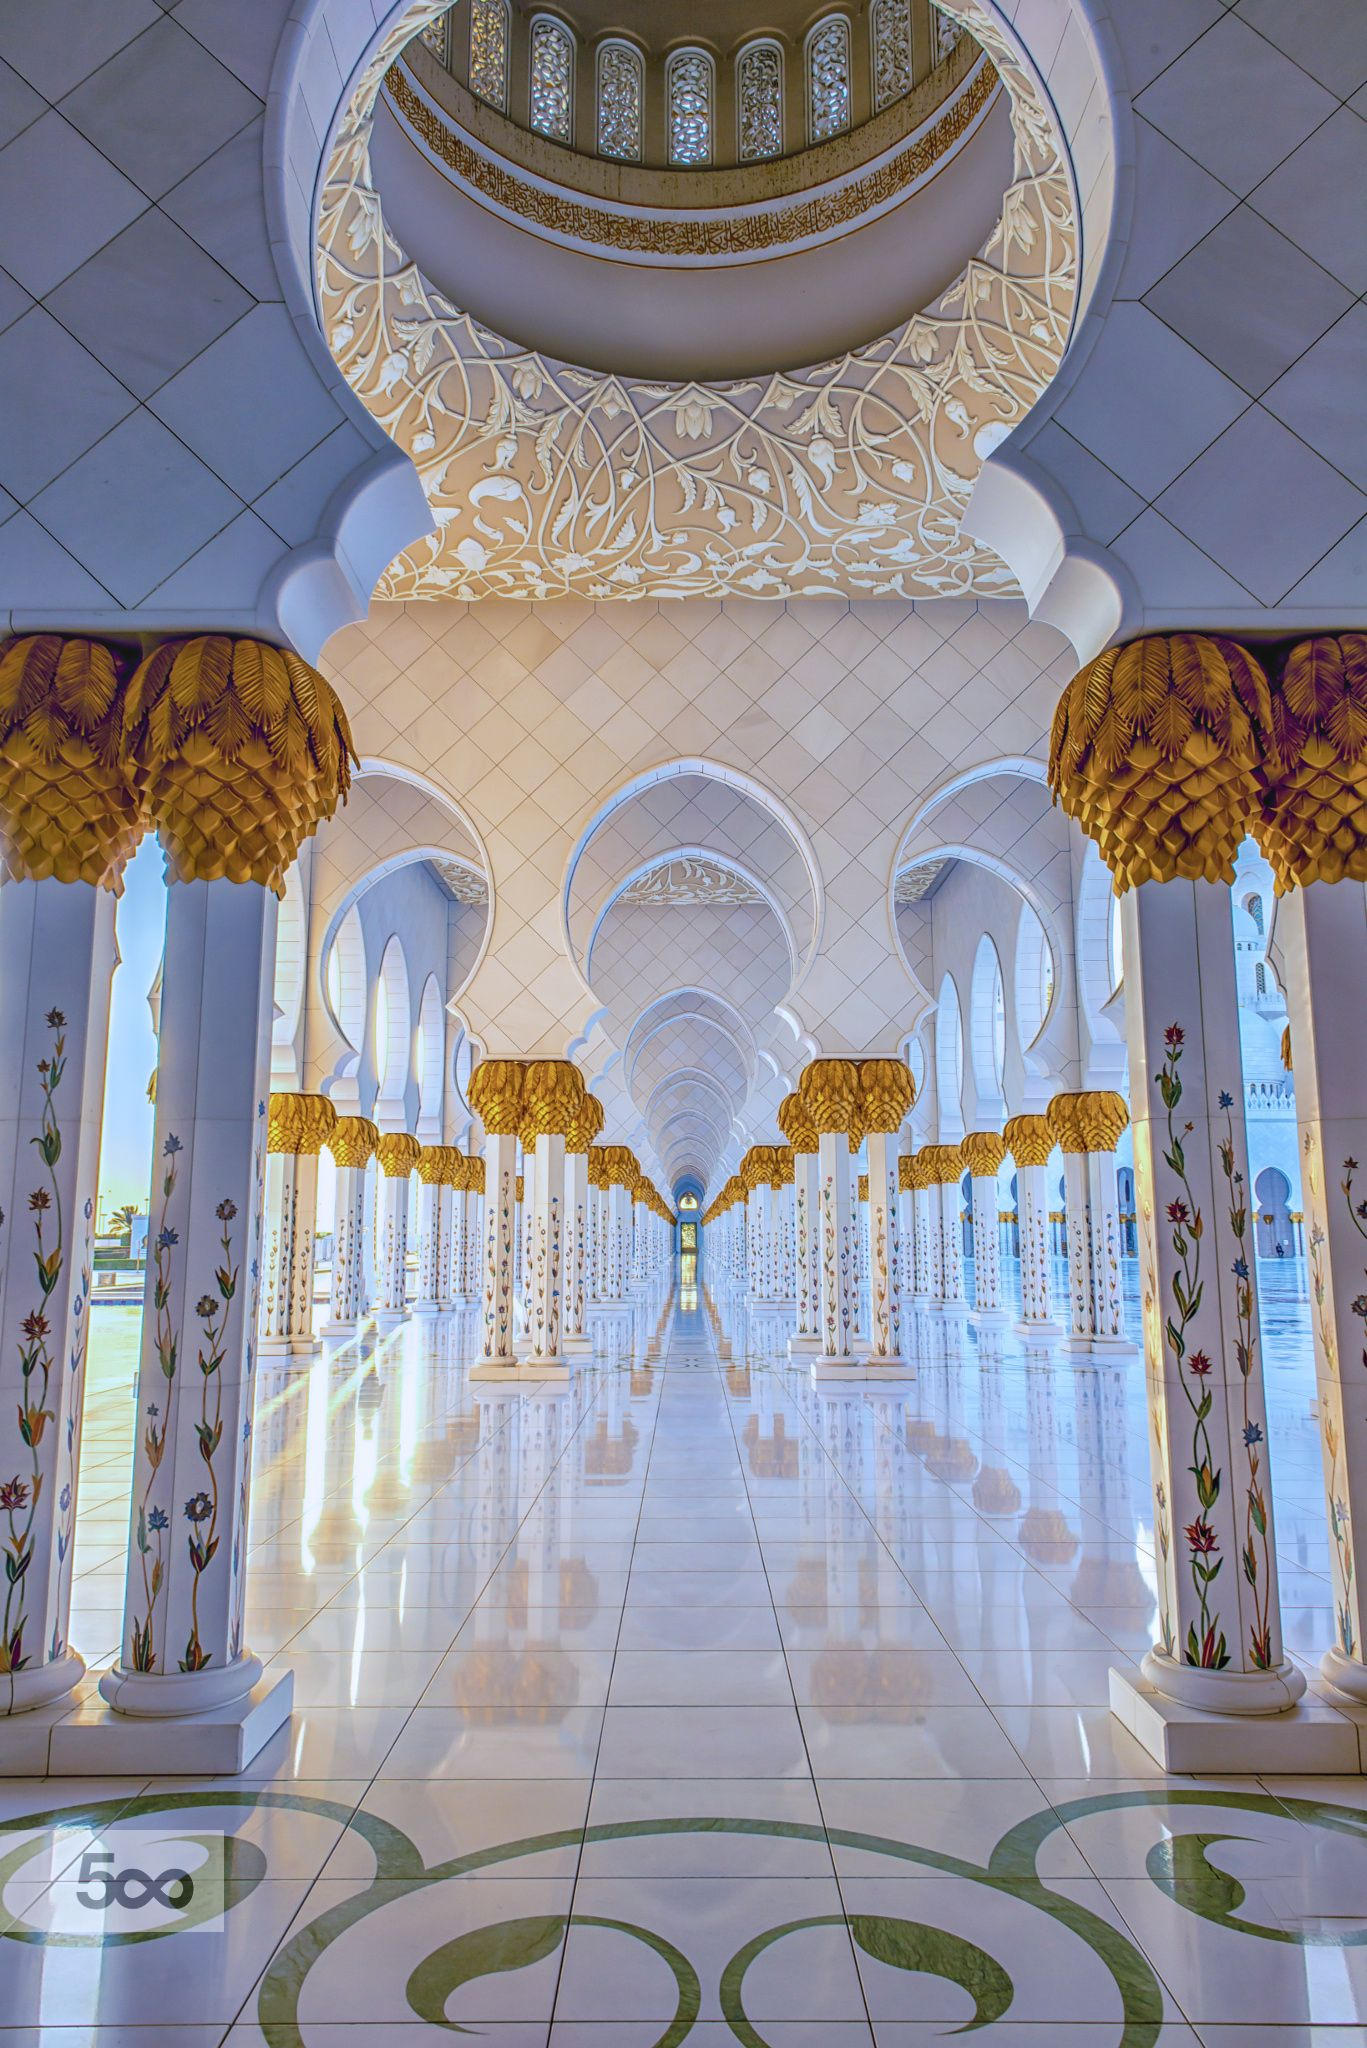 Symmetry - The Grand Mosque by julian john on 500px